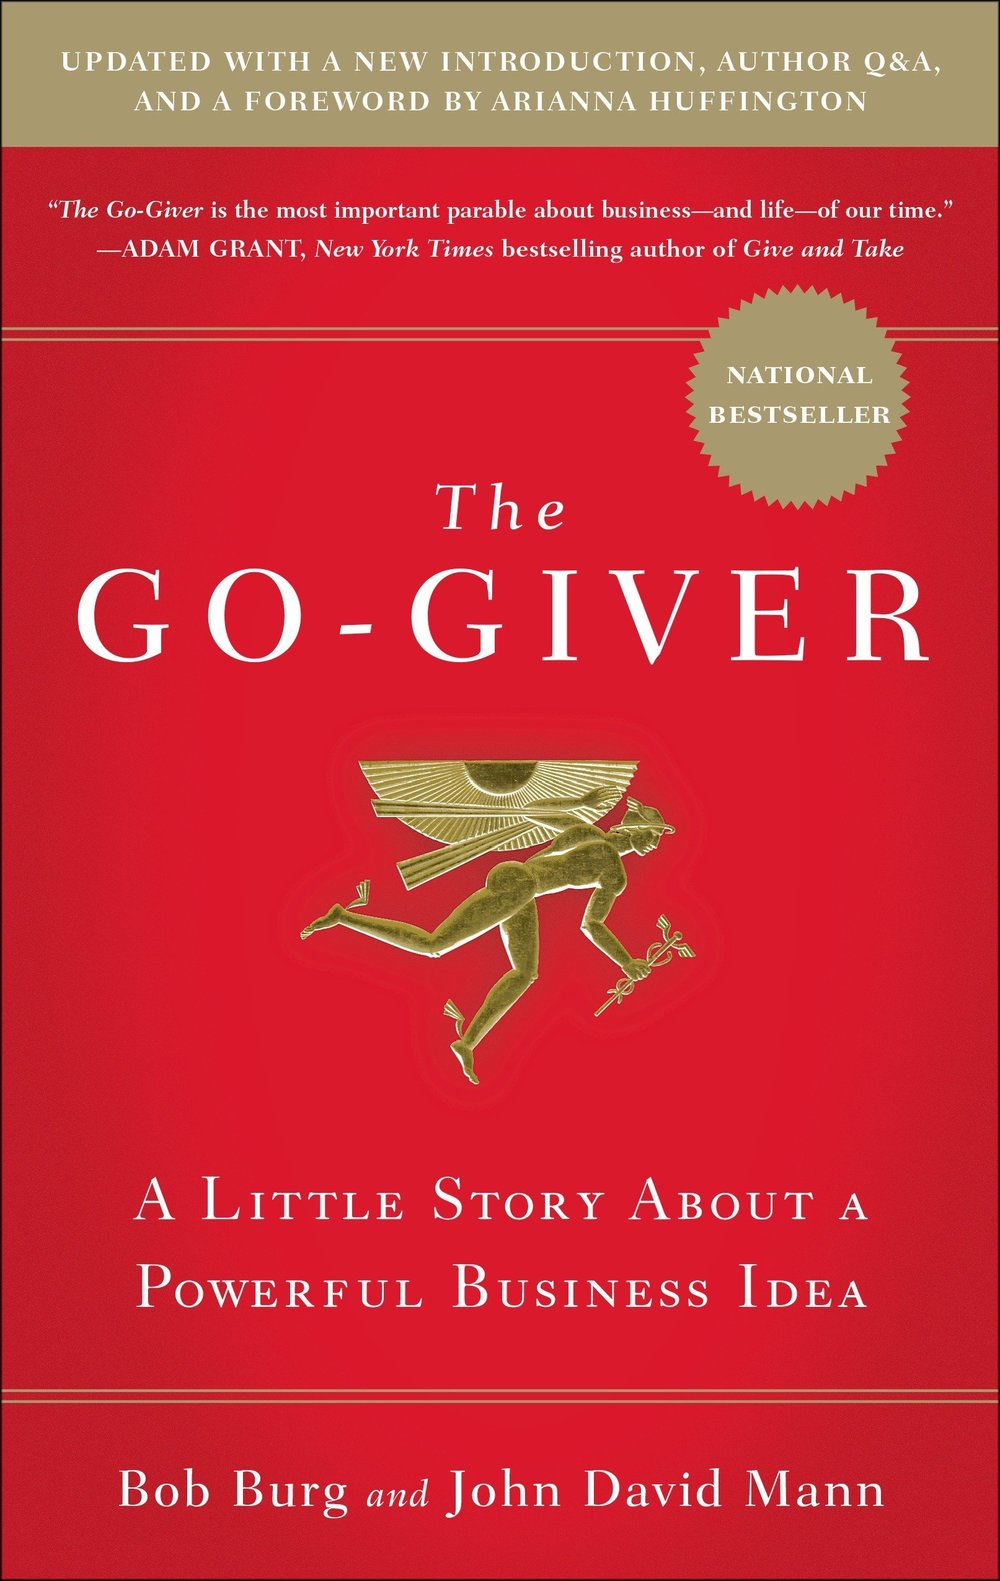 The-Go-Giver-A-little-Story-About-a-Powerful-Business-Idea-Bob-Burg-John-David-Mann.jpg